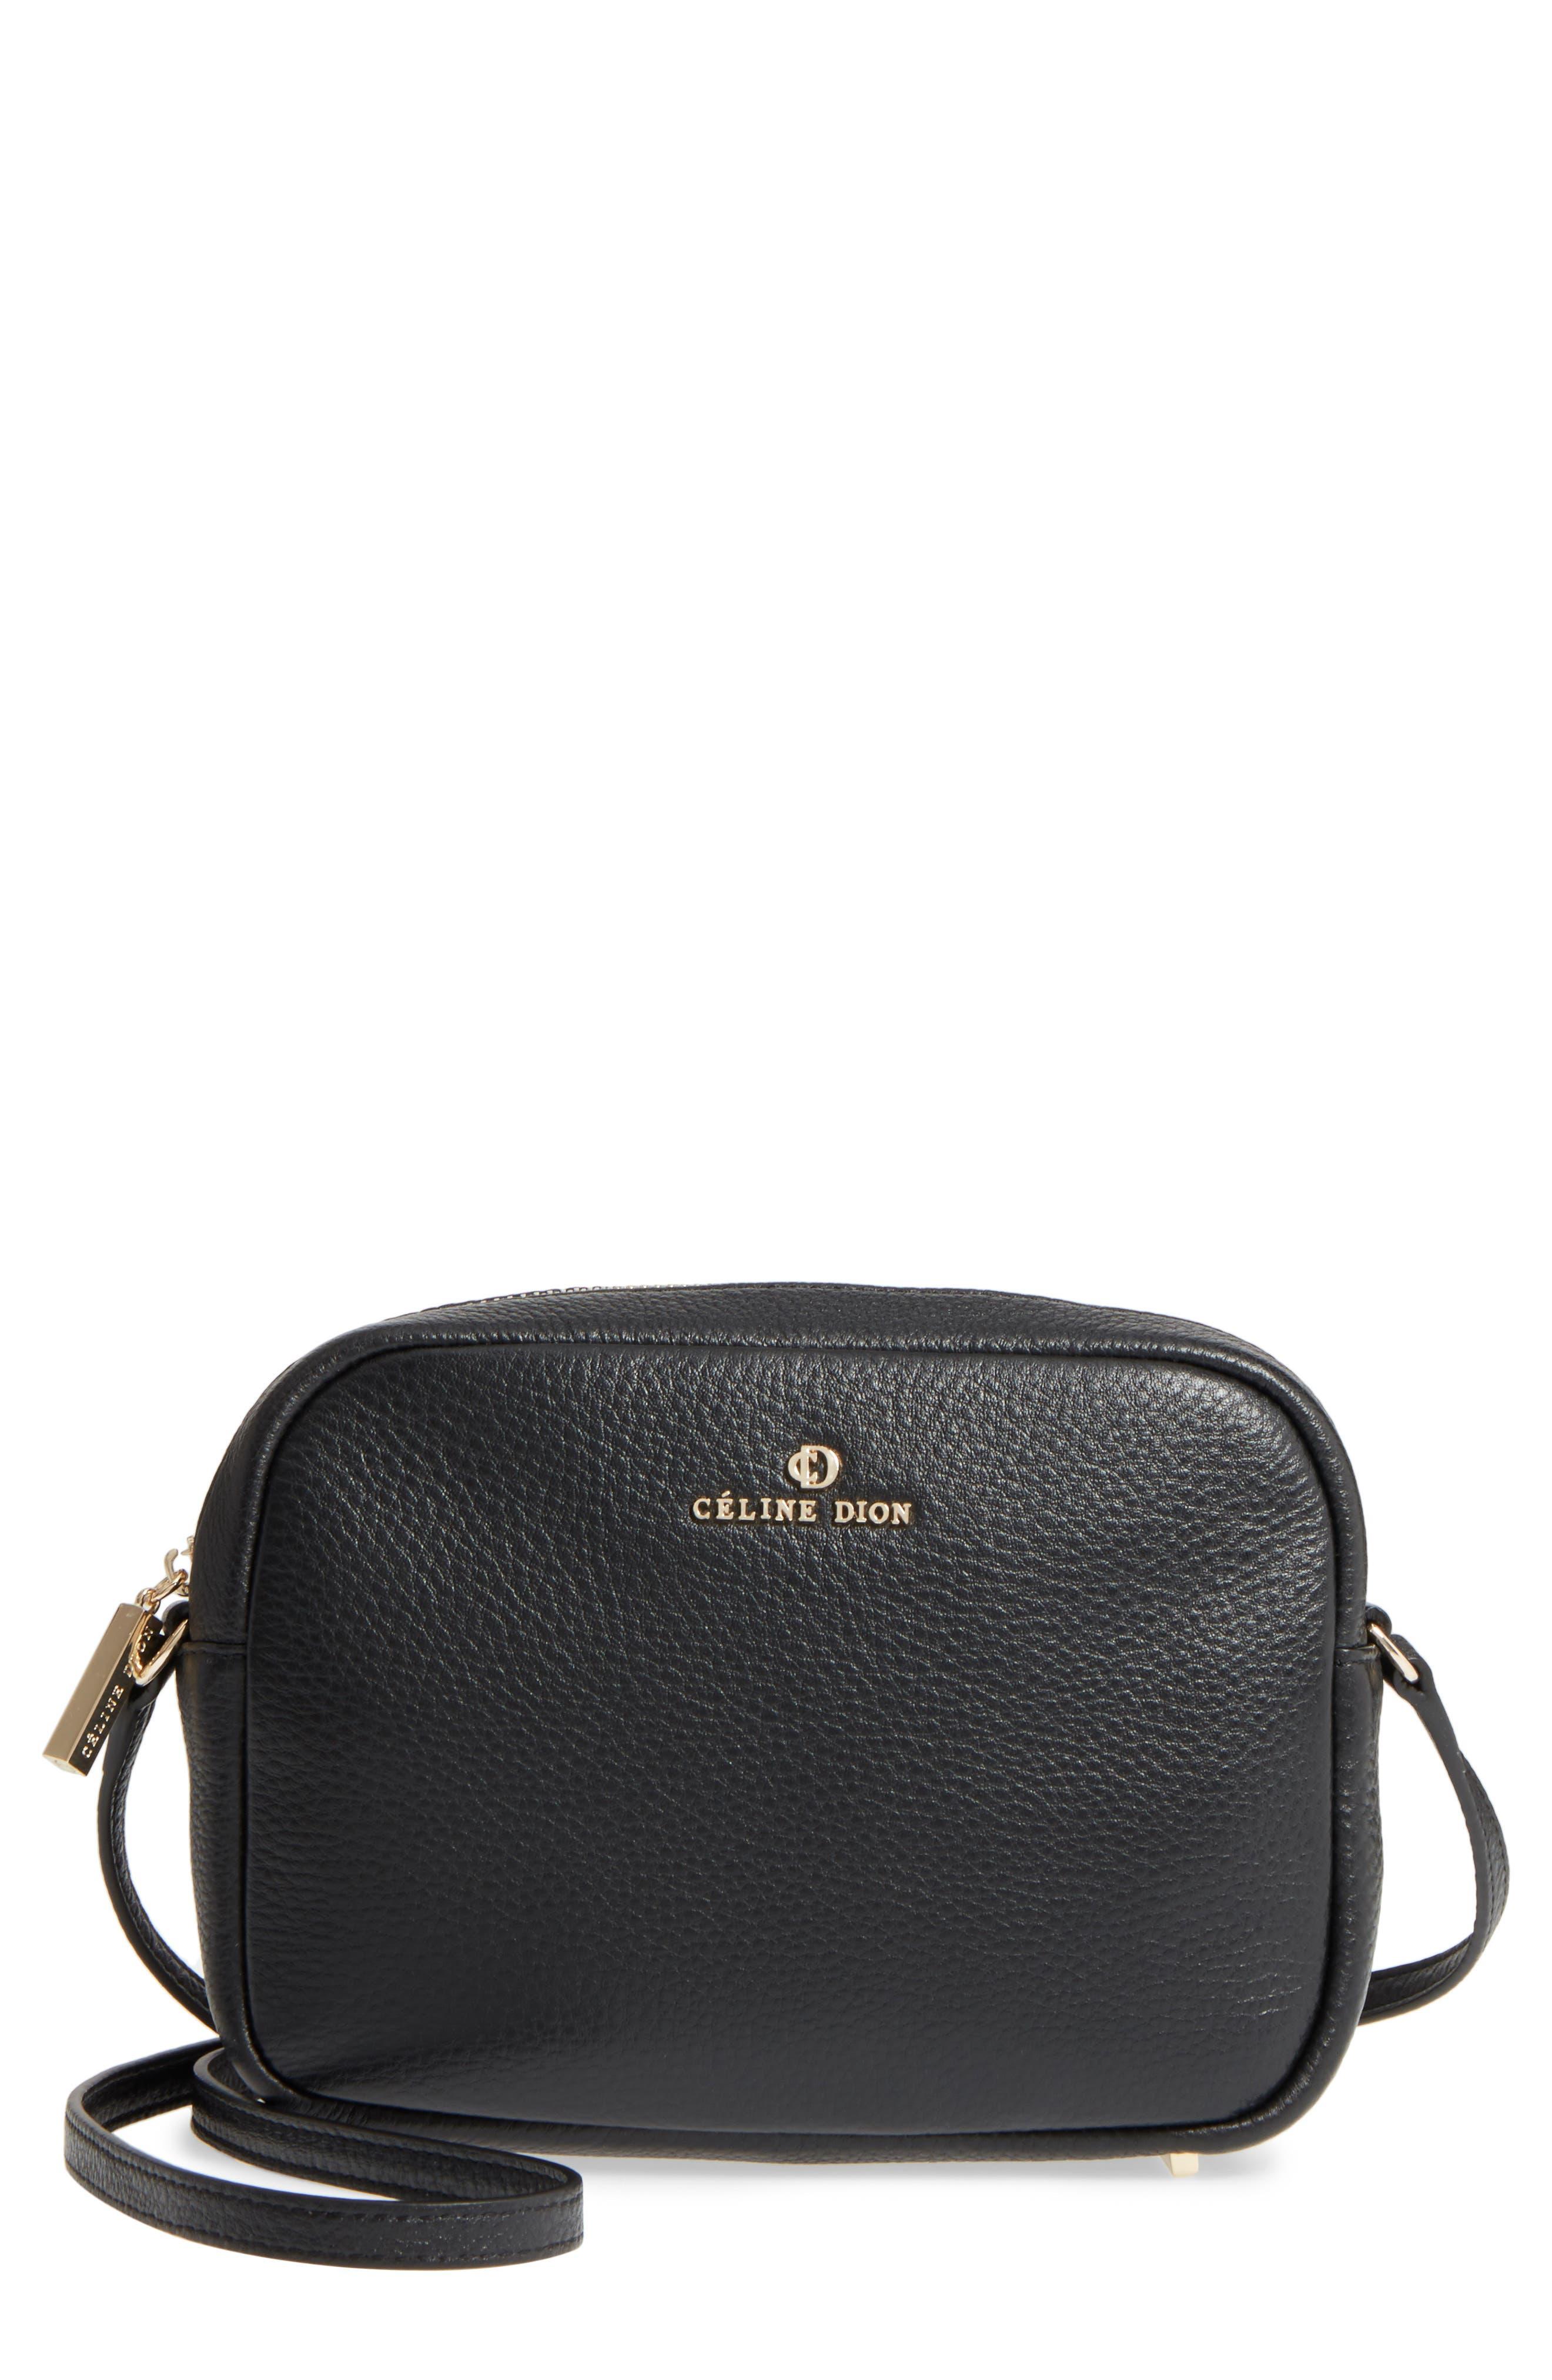 Céline Dion Adagio Leather Camera Crossbody Bag,                             Main thumbnail 1, color,                             001